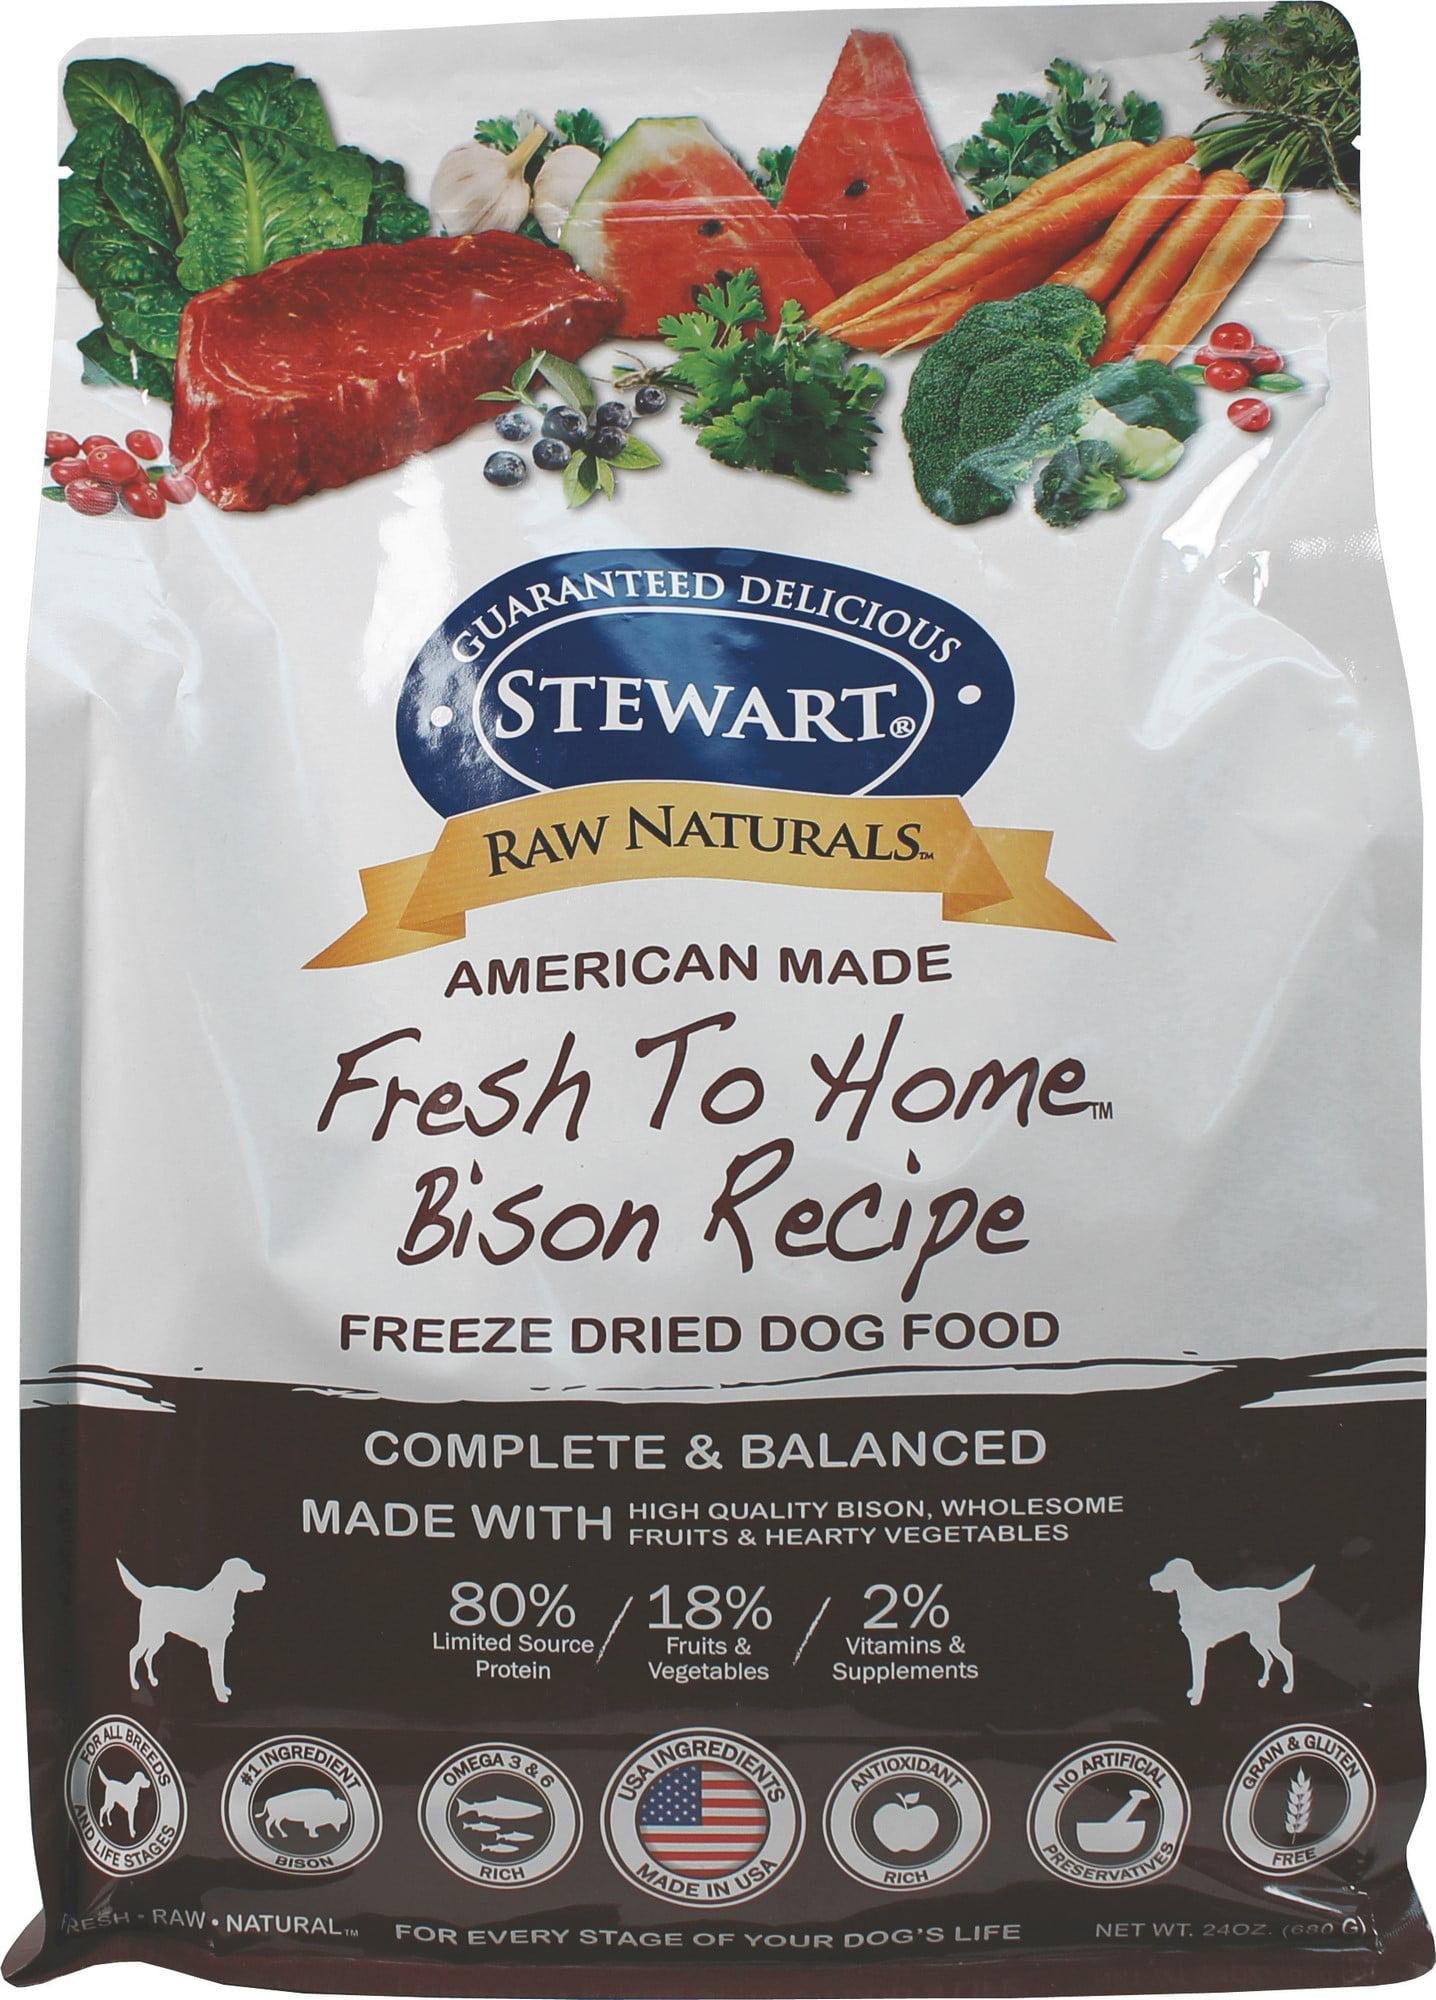 Stewart Raw Naturals Bison Recipe Freeze Dried Dog Food 24 Oz Walmart Com Walmart Com